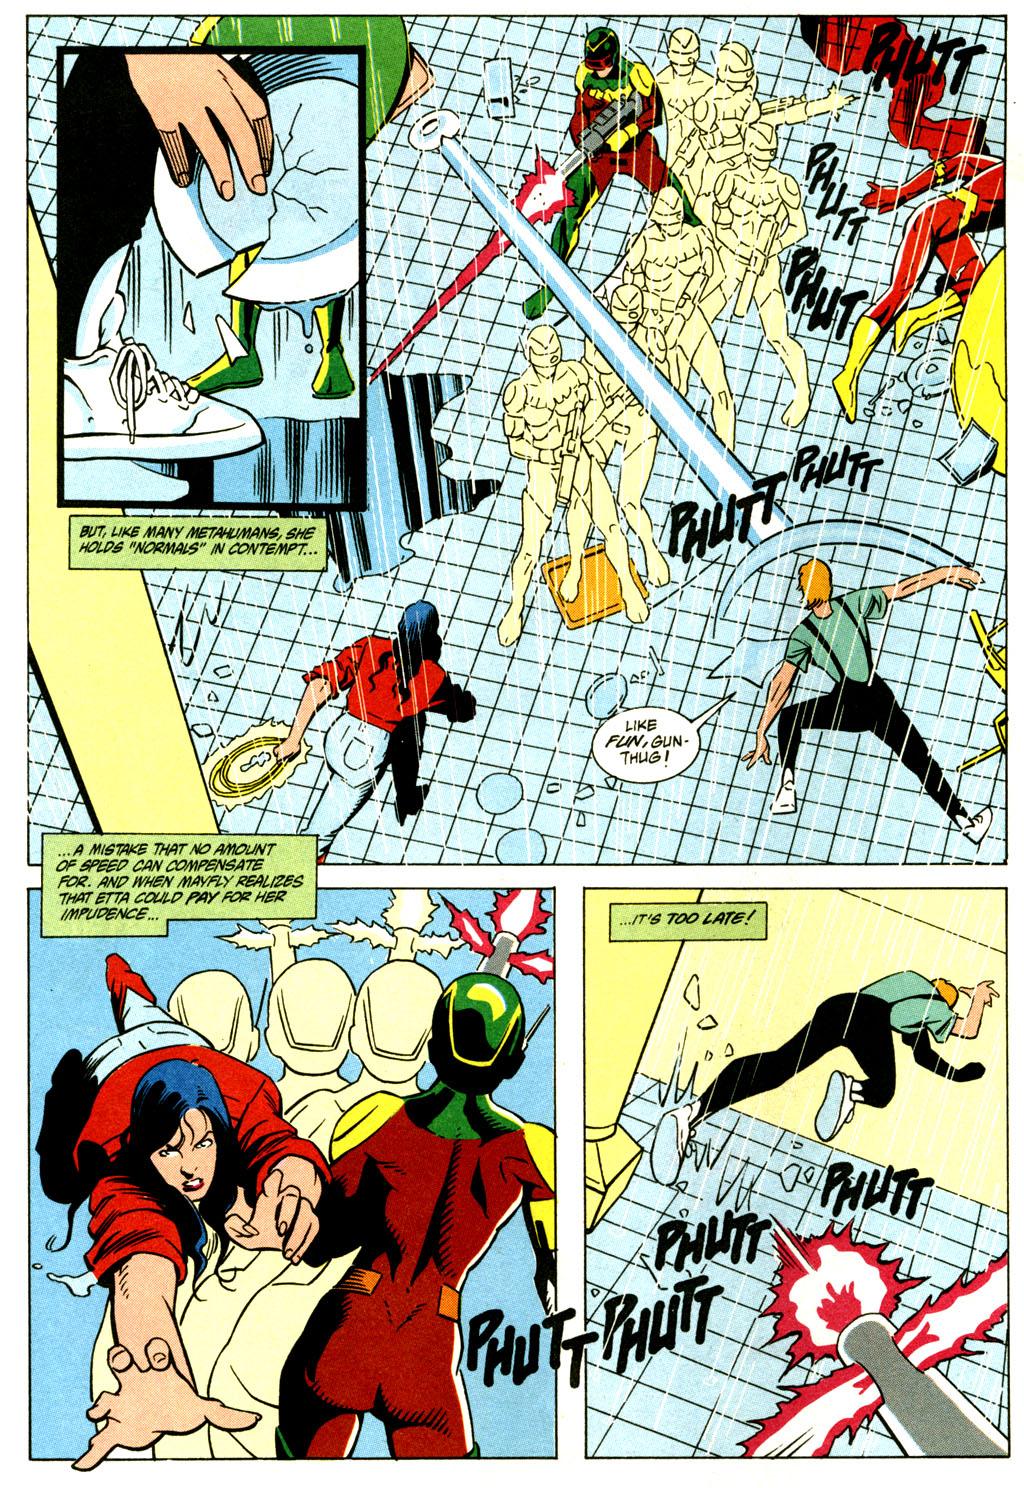 Read online Wonder Woman (1987) comic -  Issue #79 - 4